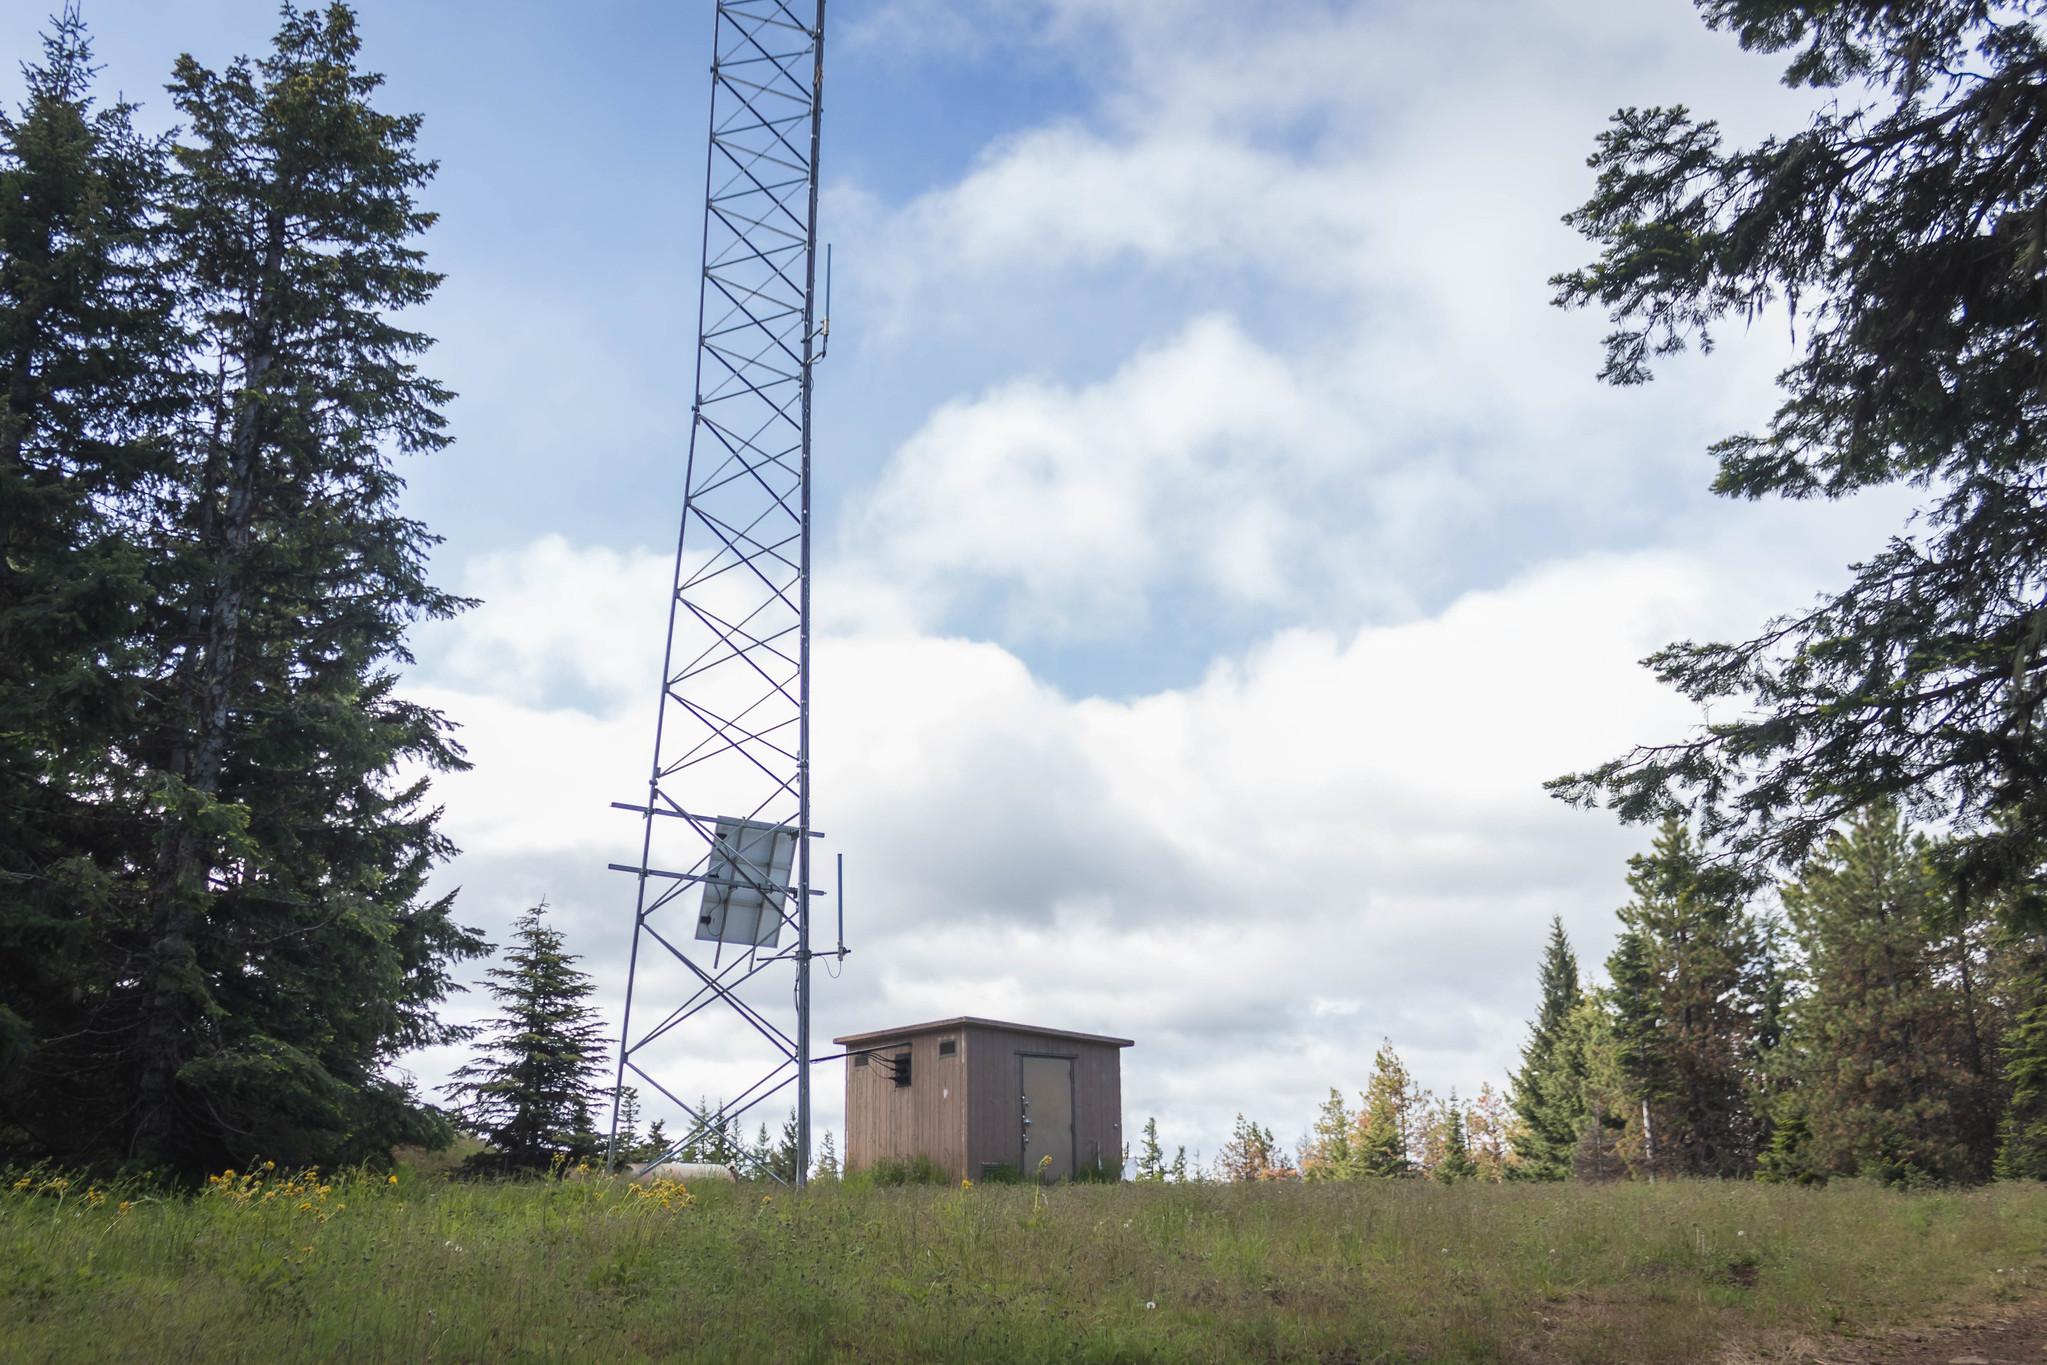 South Clem Ridge East Peak #2